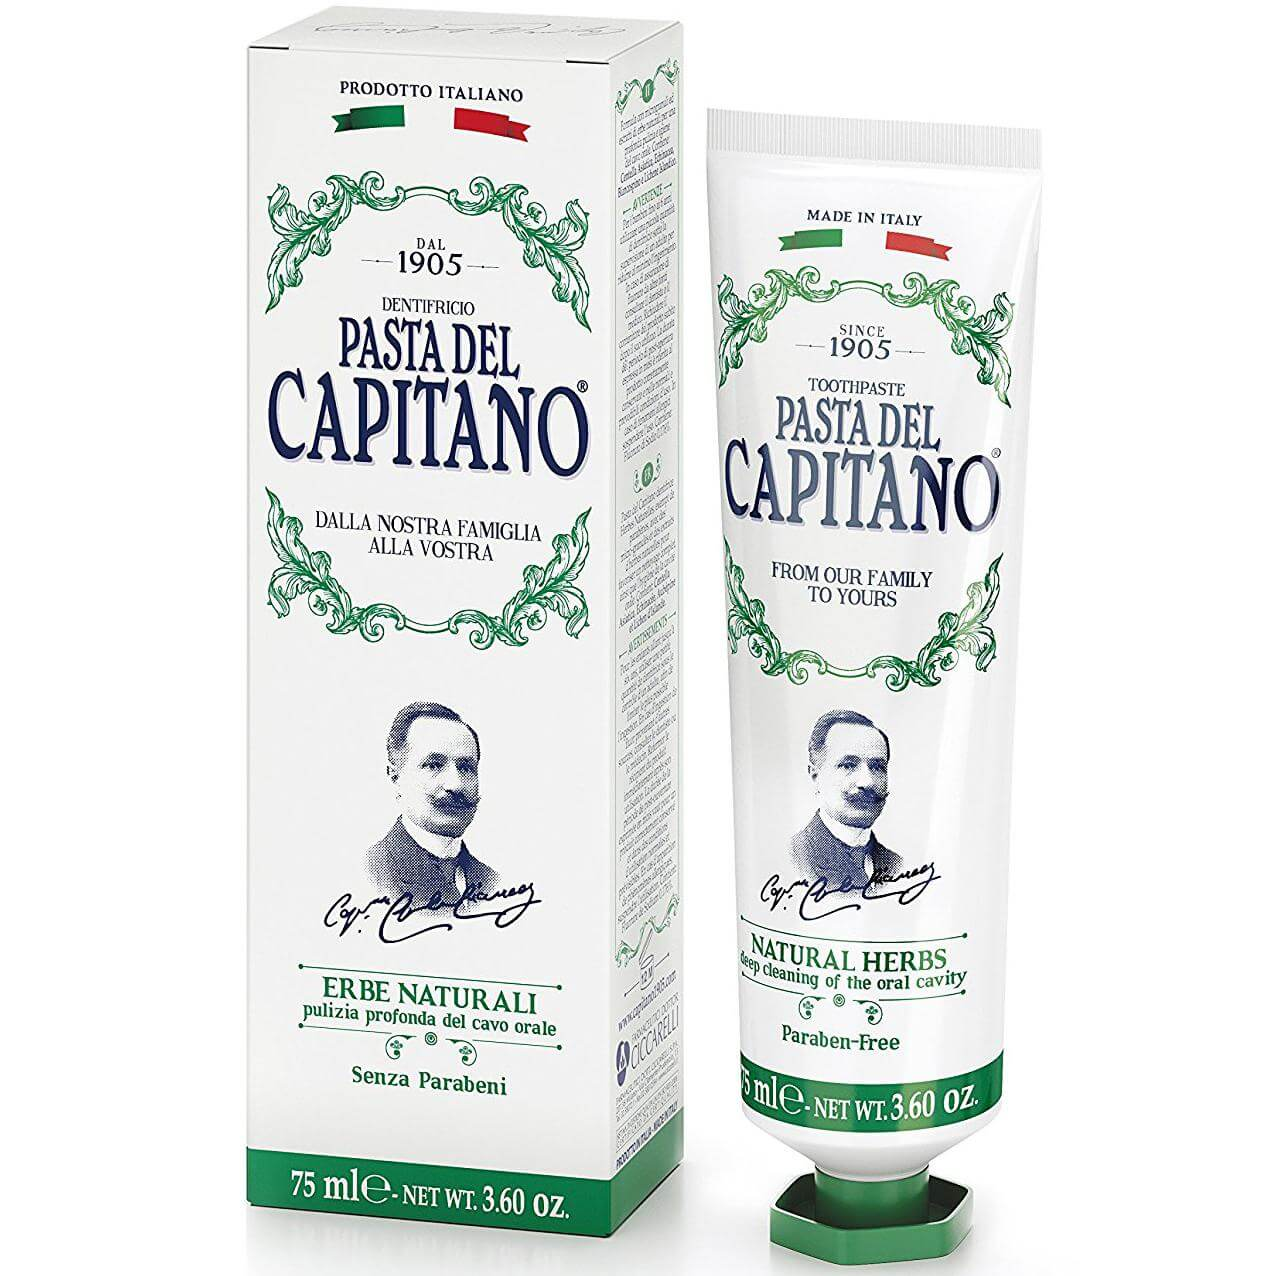 Pasta Del Capitano Natural Herbs Toothpaste Οδοντόκρεμα με Καταπραϋντικές Ιδιότητες, Καταπολεμά Τους Ερεθισμούς 75ml